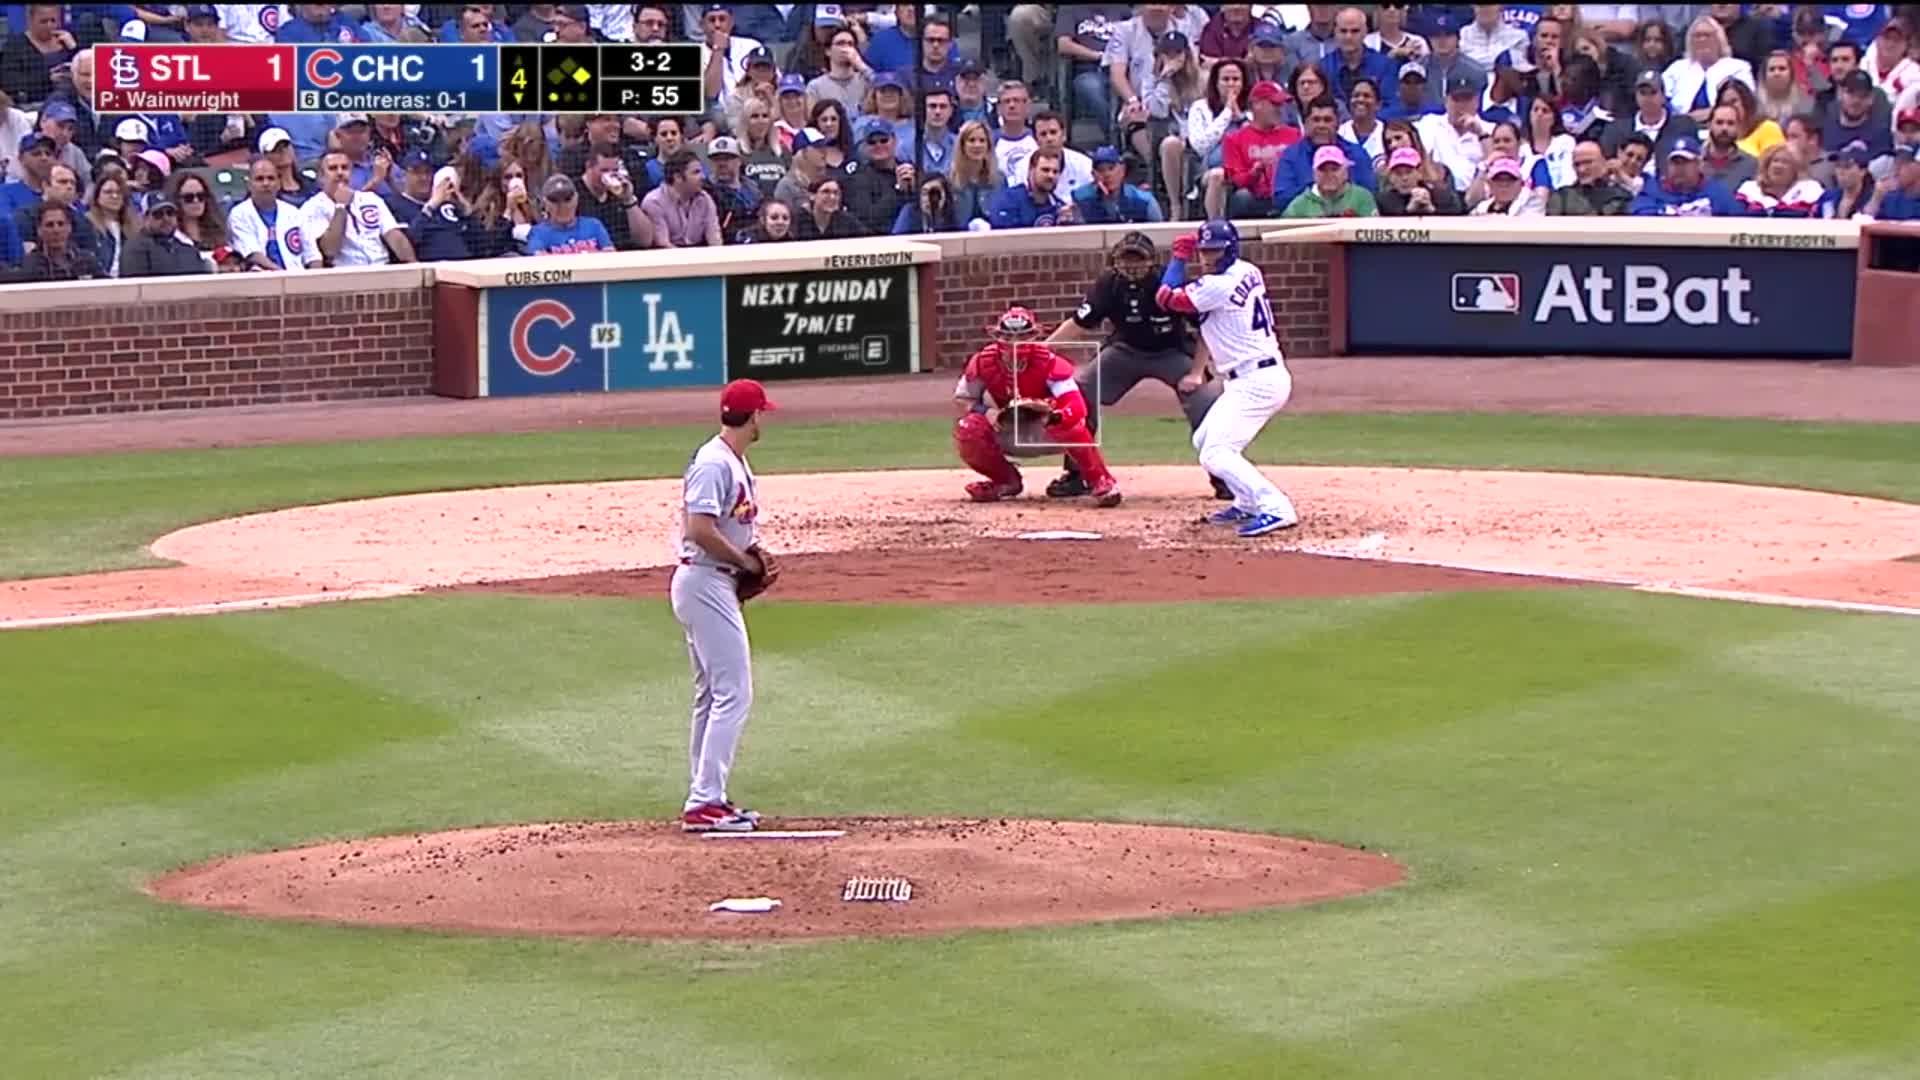 baseball, cardinals, chicago, chicago cubs, cubs, st louis cardinals, st. louis, Strike 'em out, throw 'em out. GIFs